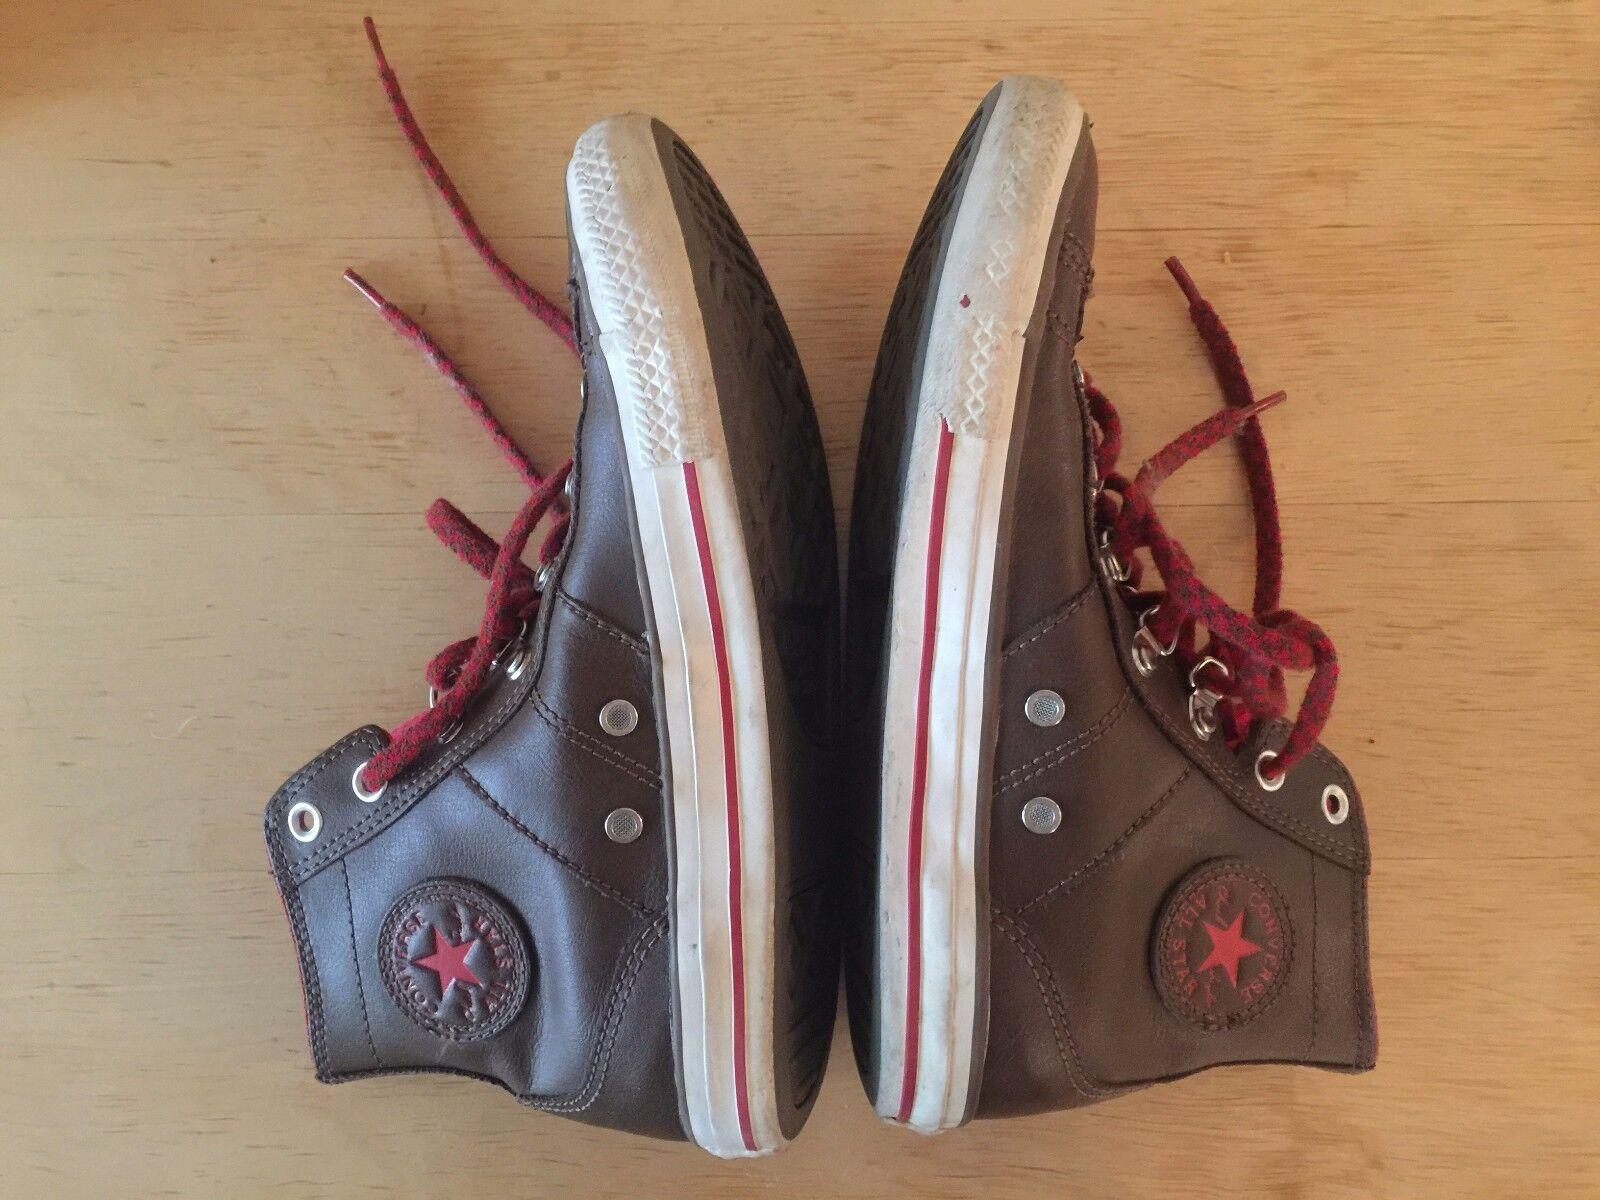 Converse Chuck Taylor Leather Marron Hiker Sneaker   chaussures  Hi Top Femme  Sz 7